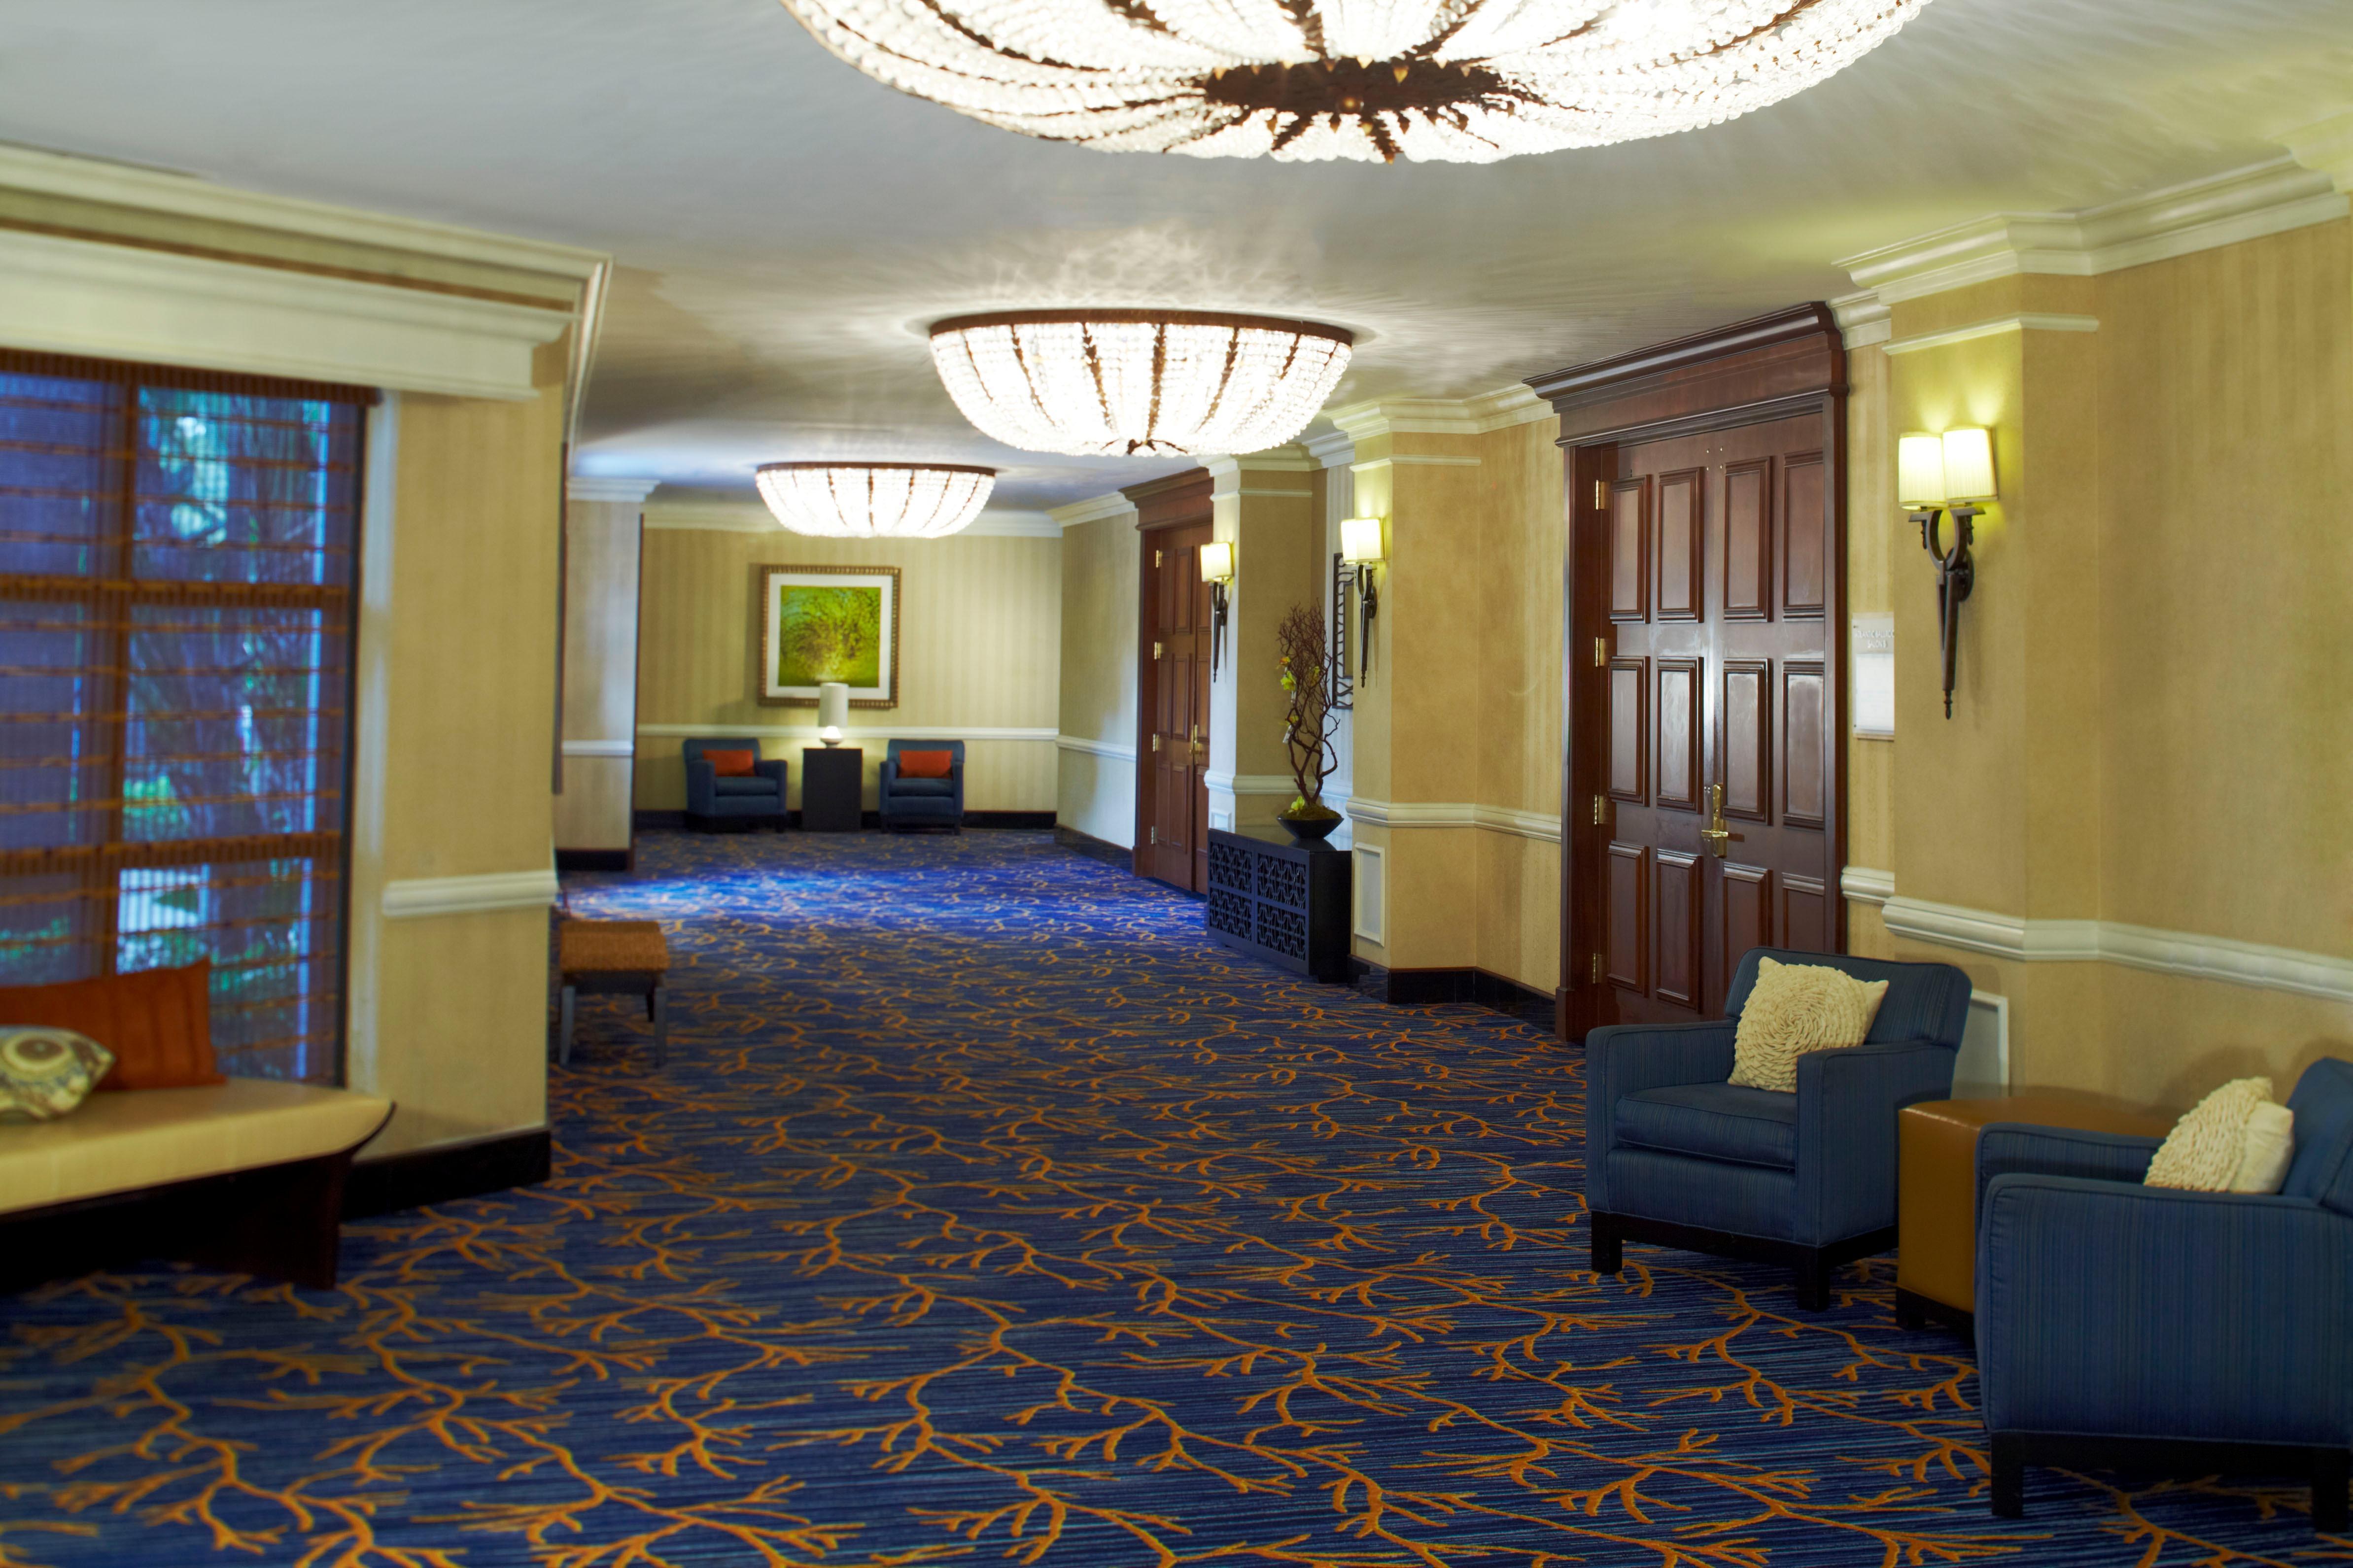 Renaissance Fort Lauderdale Cruise Port Hotel image 23